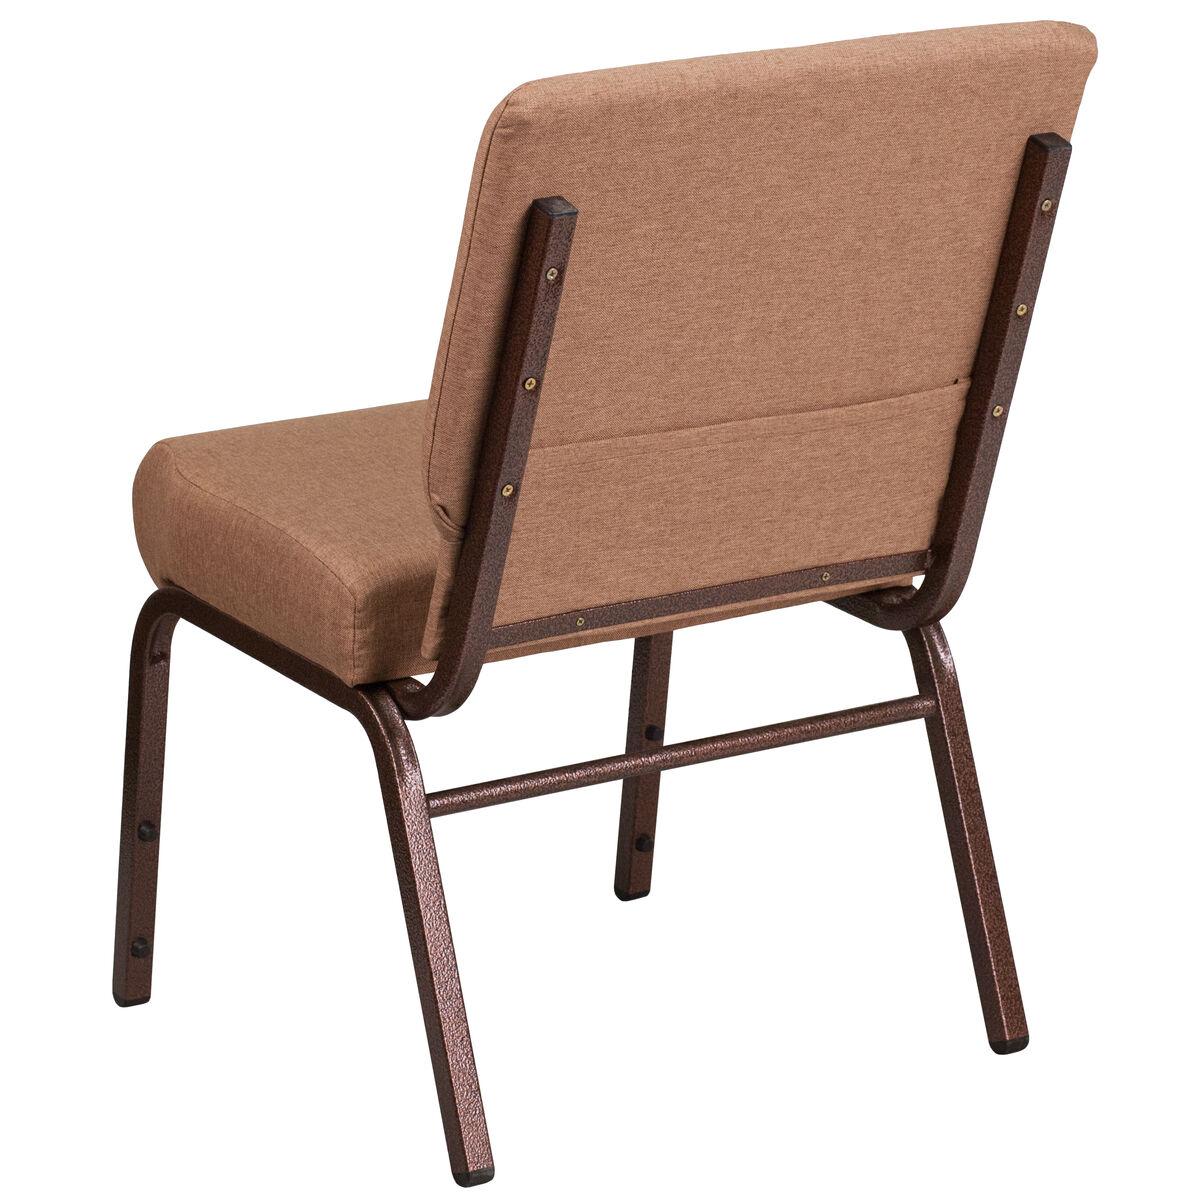 Hercules Series 21 W Stacking Church Chair In Caramel